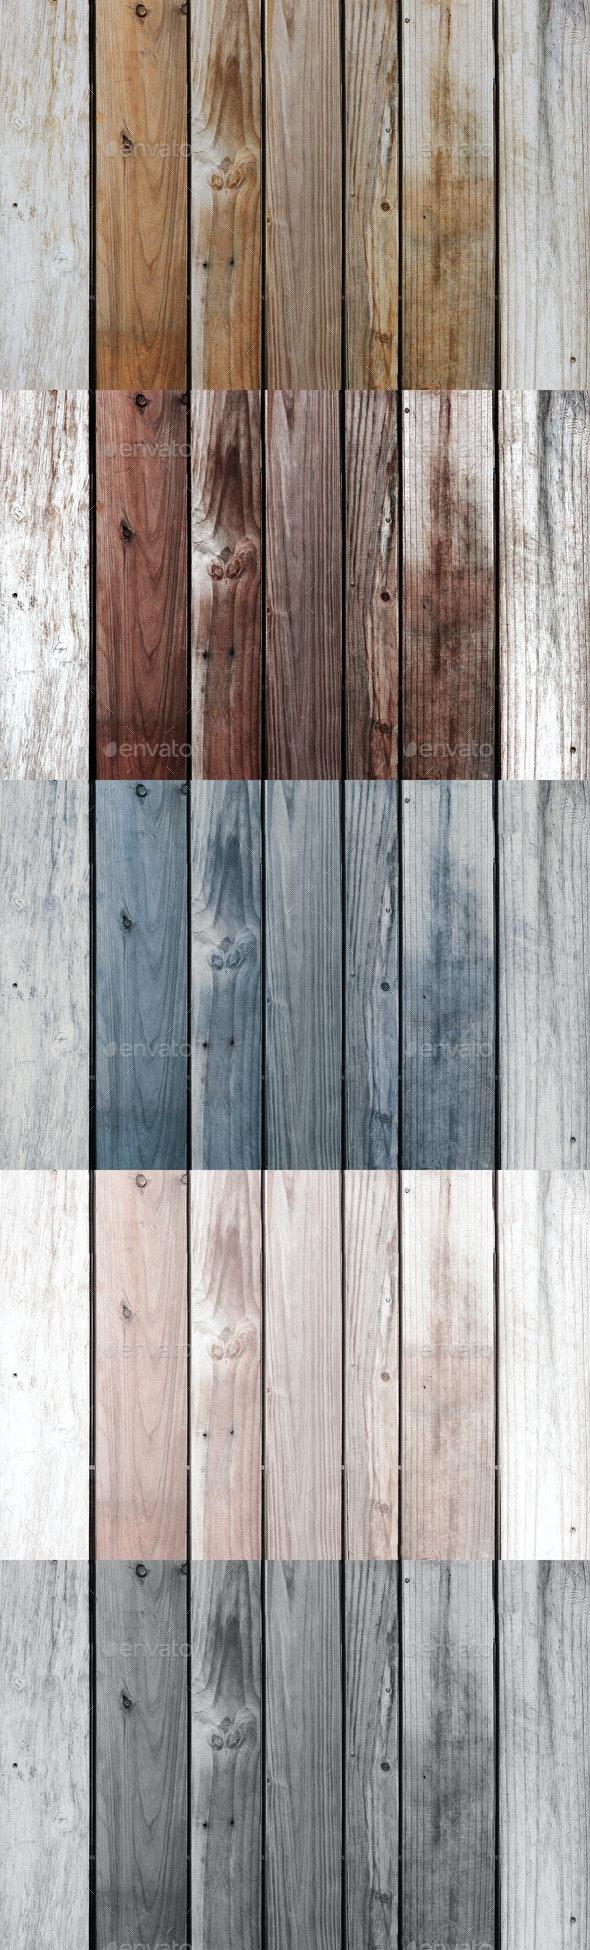 Wood Texture V.4 - Wood Textures